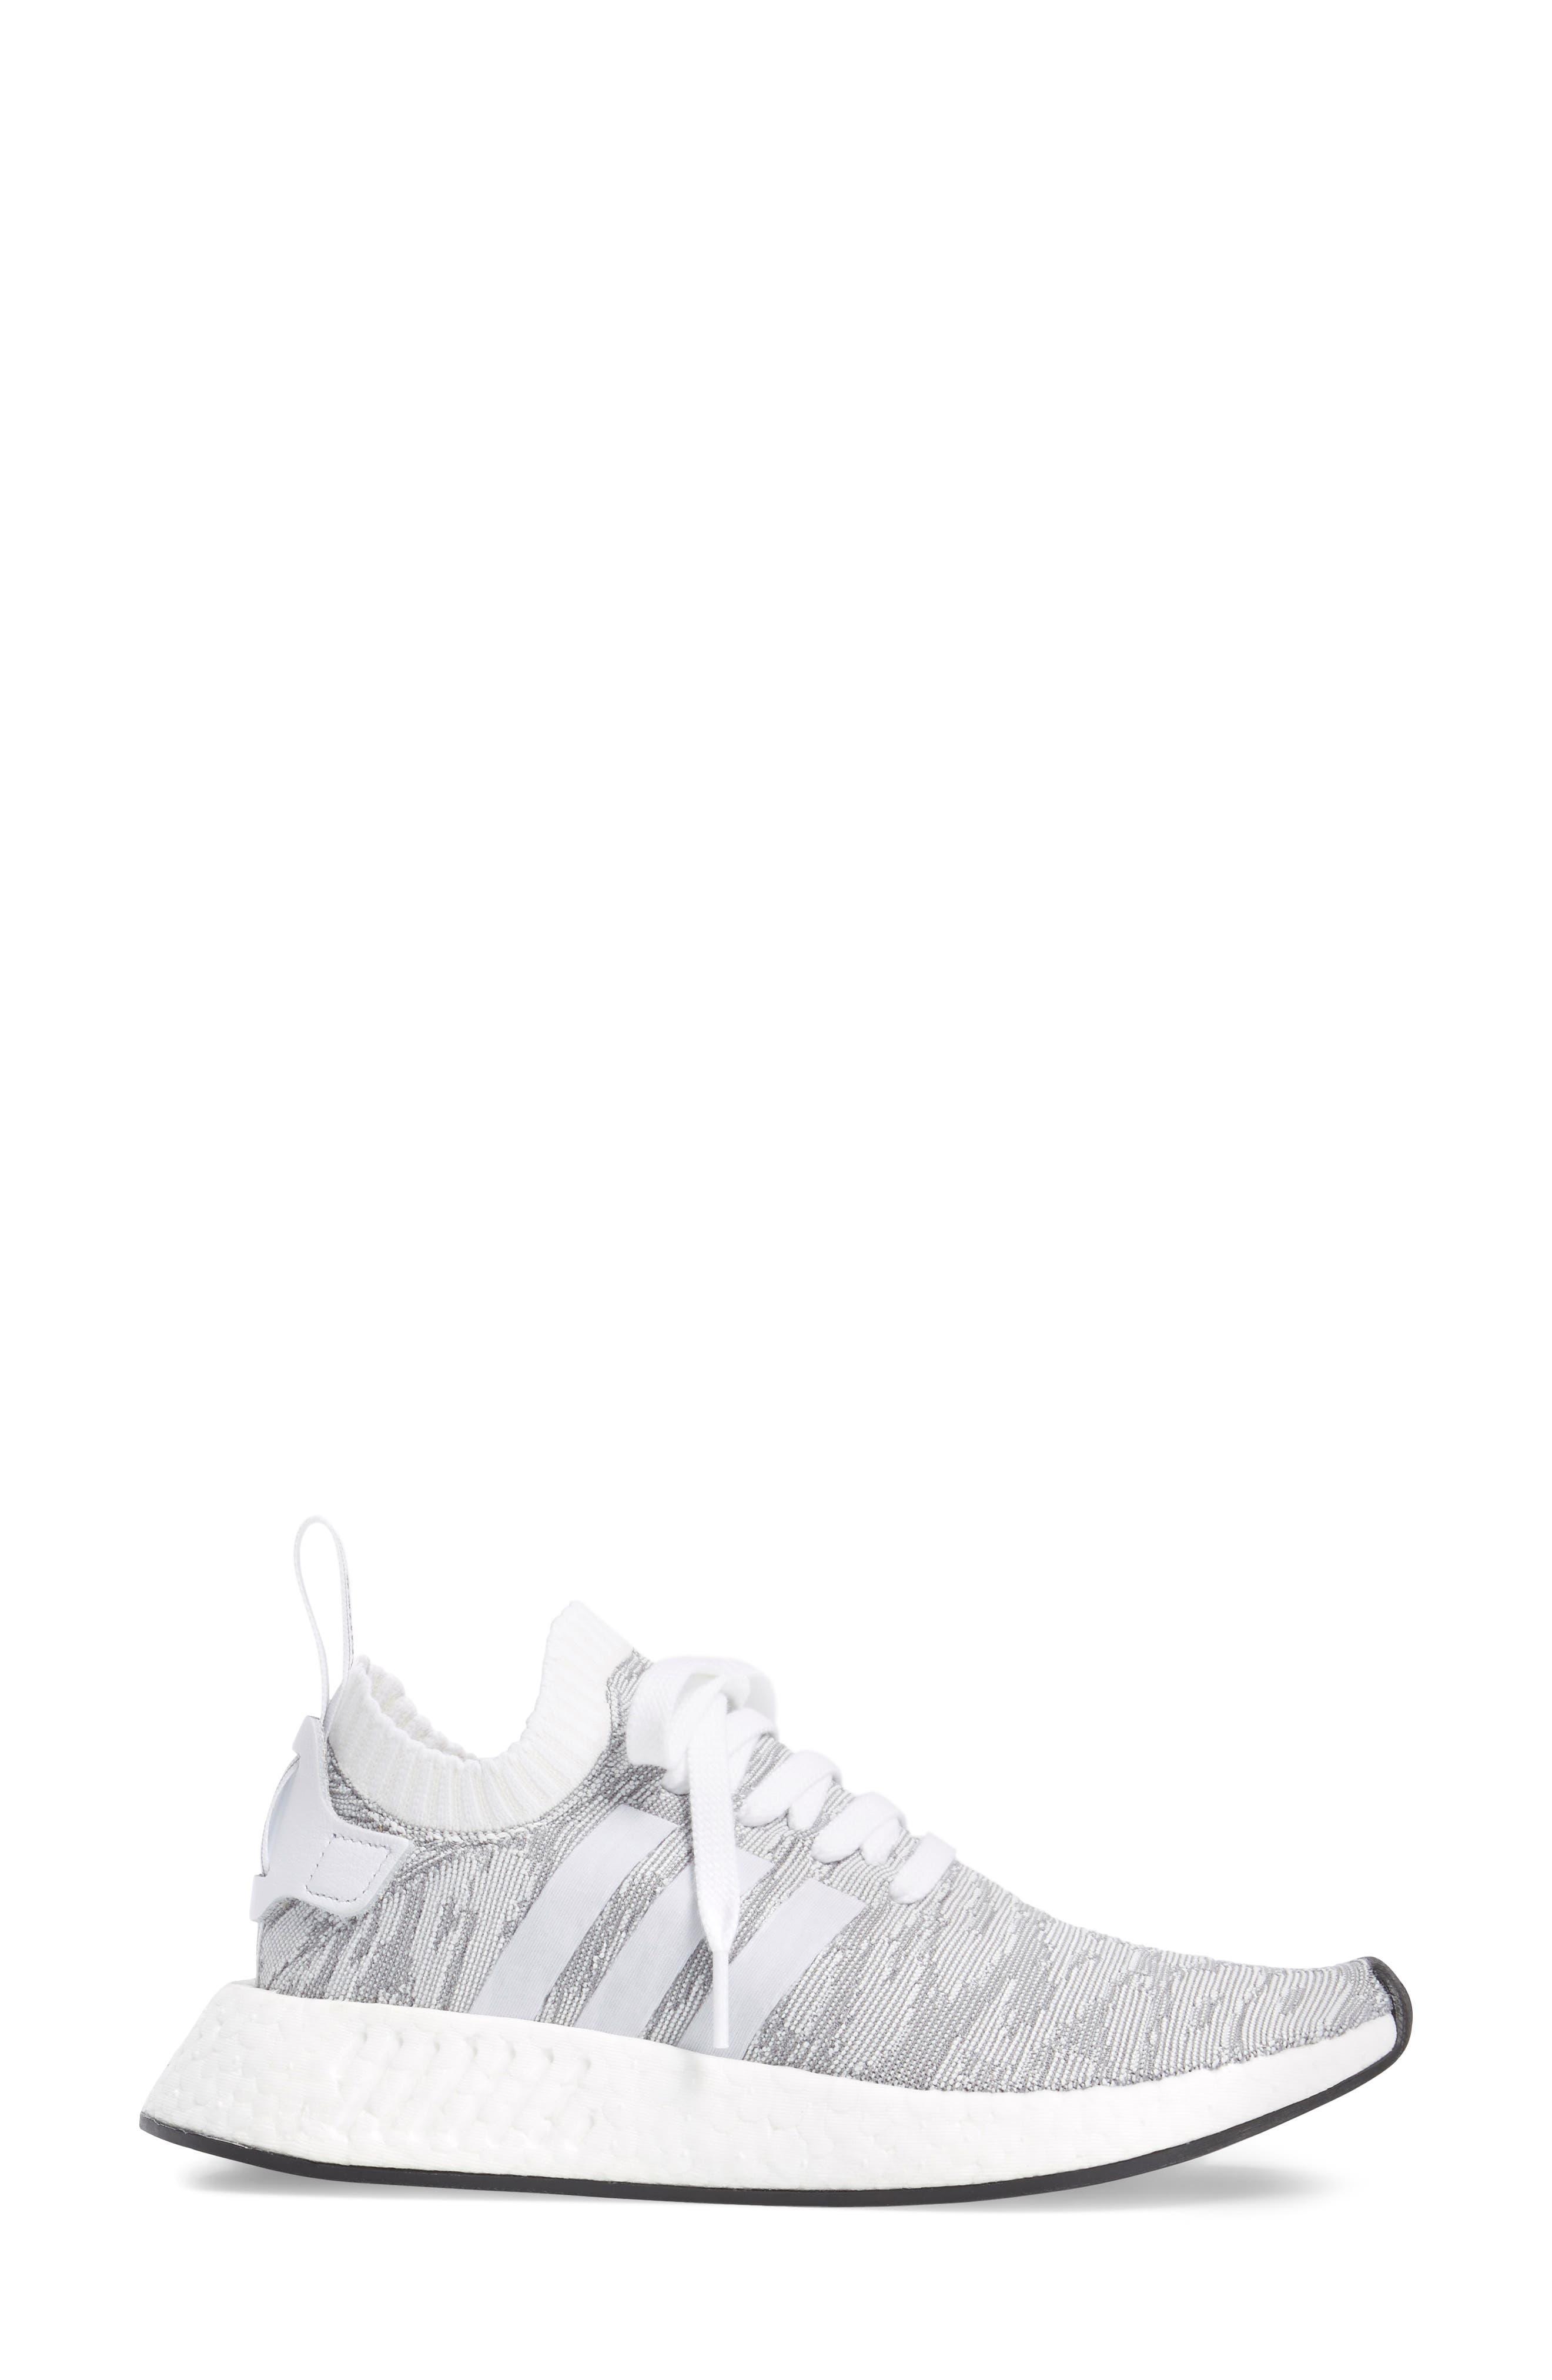 NMD R2 Primeknit Athletic Shoe,                             Alternate thumbnail 13, color,